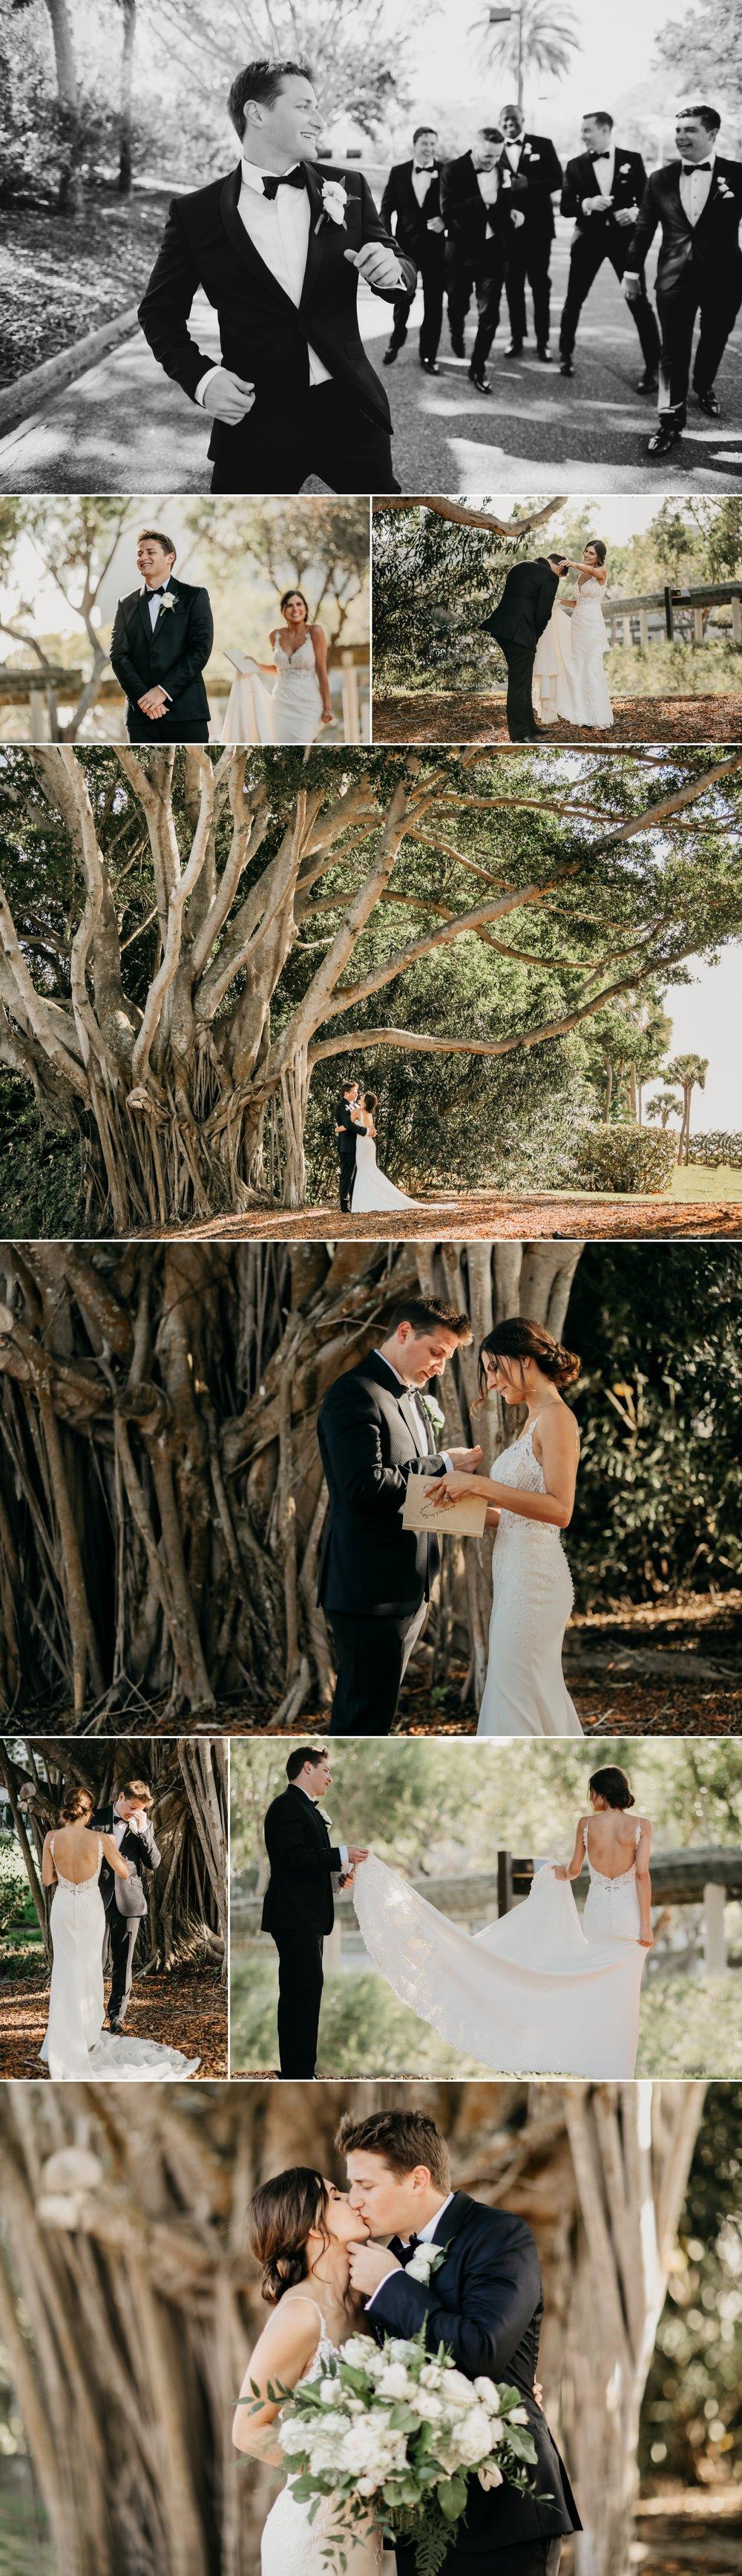 Luxe_tropical_travel_destination_wedding_photography_ShainaDeCiryan.com12.jpg